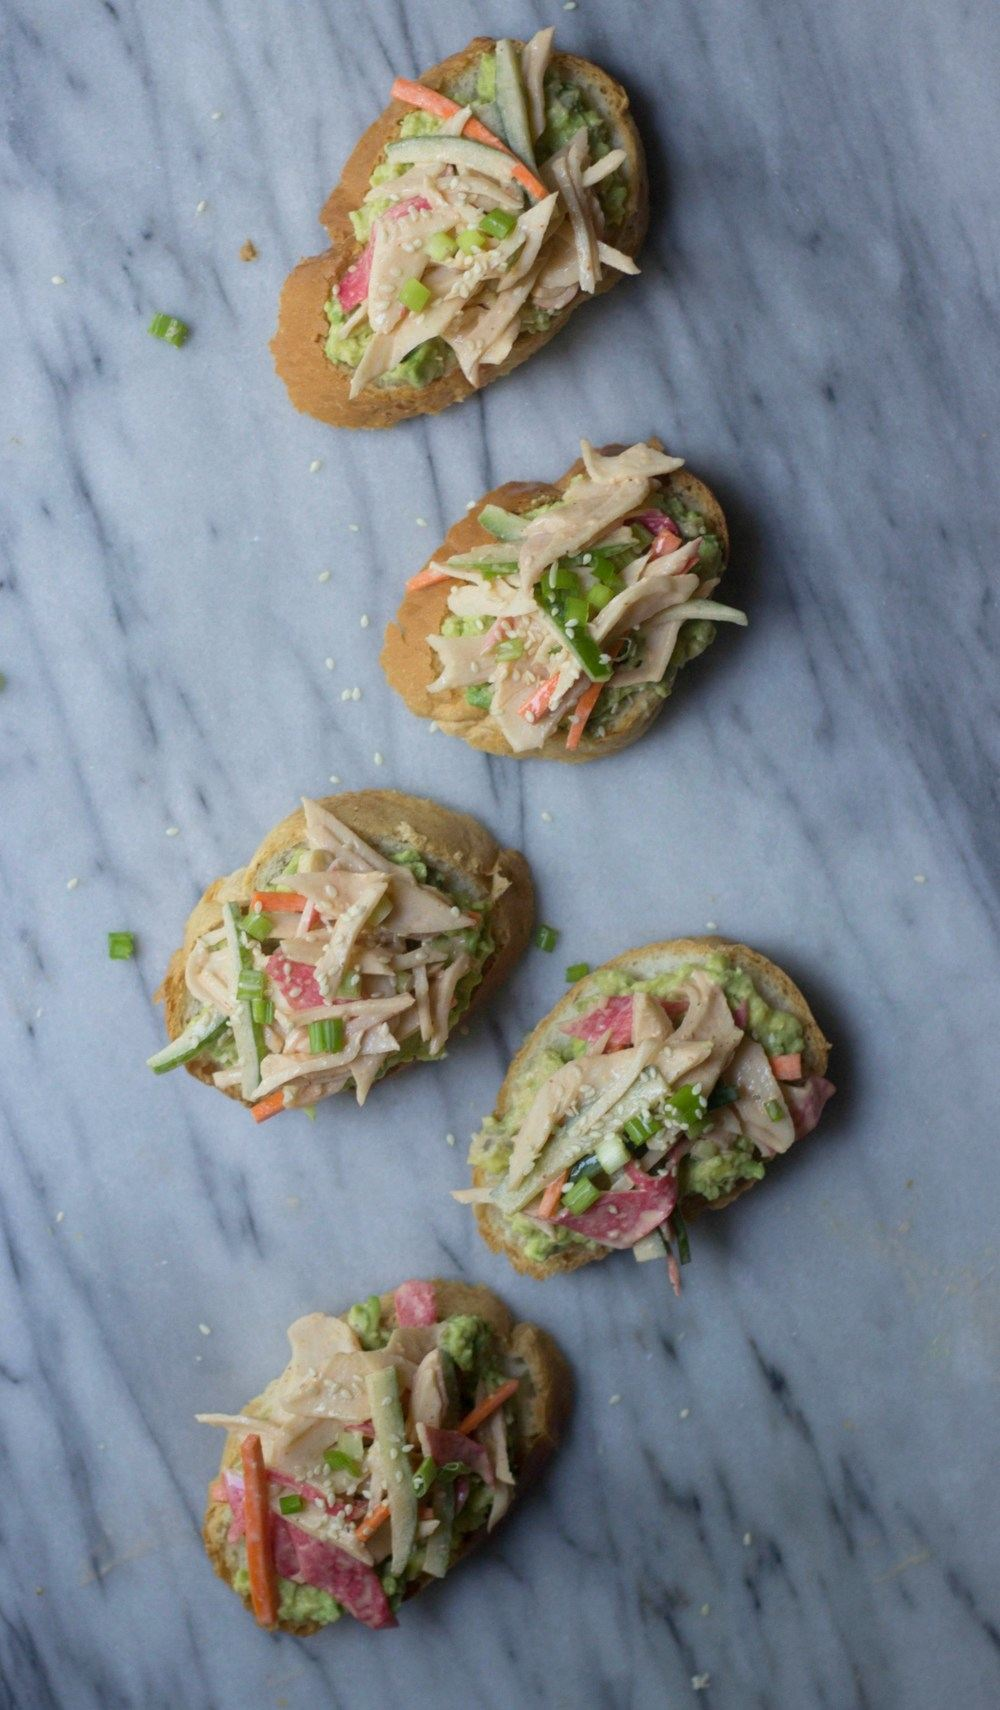 Asian Crab Salad Avocado Toast Recipe | HeyFood — heyfoodapp.com